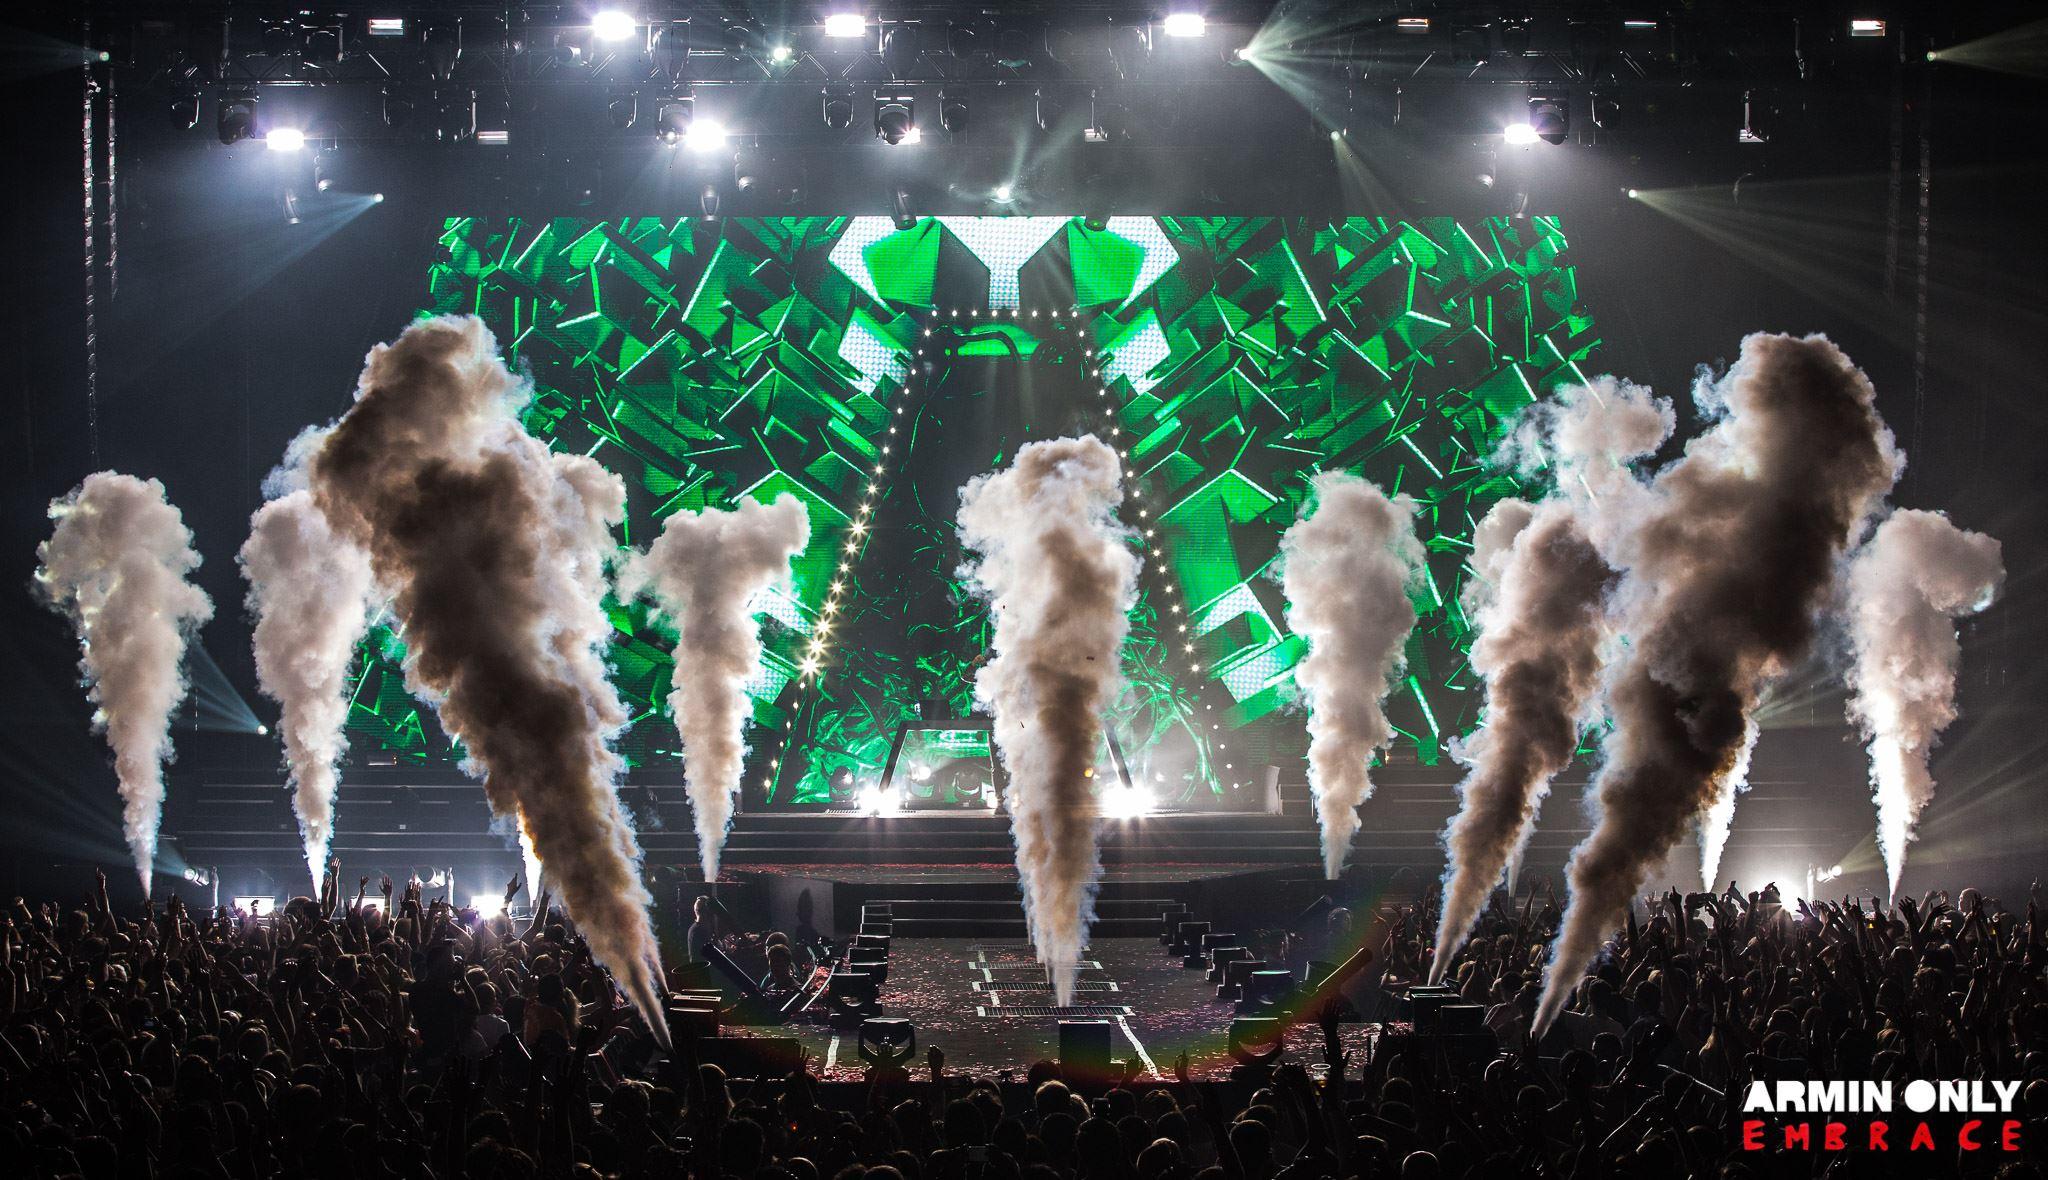 Armin Only Intense @ Holanda